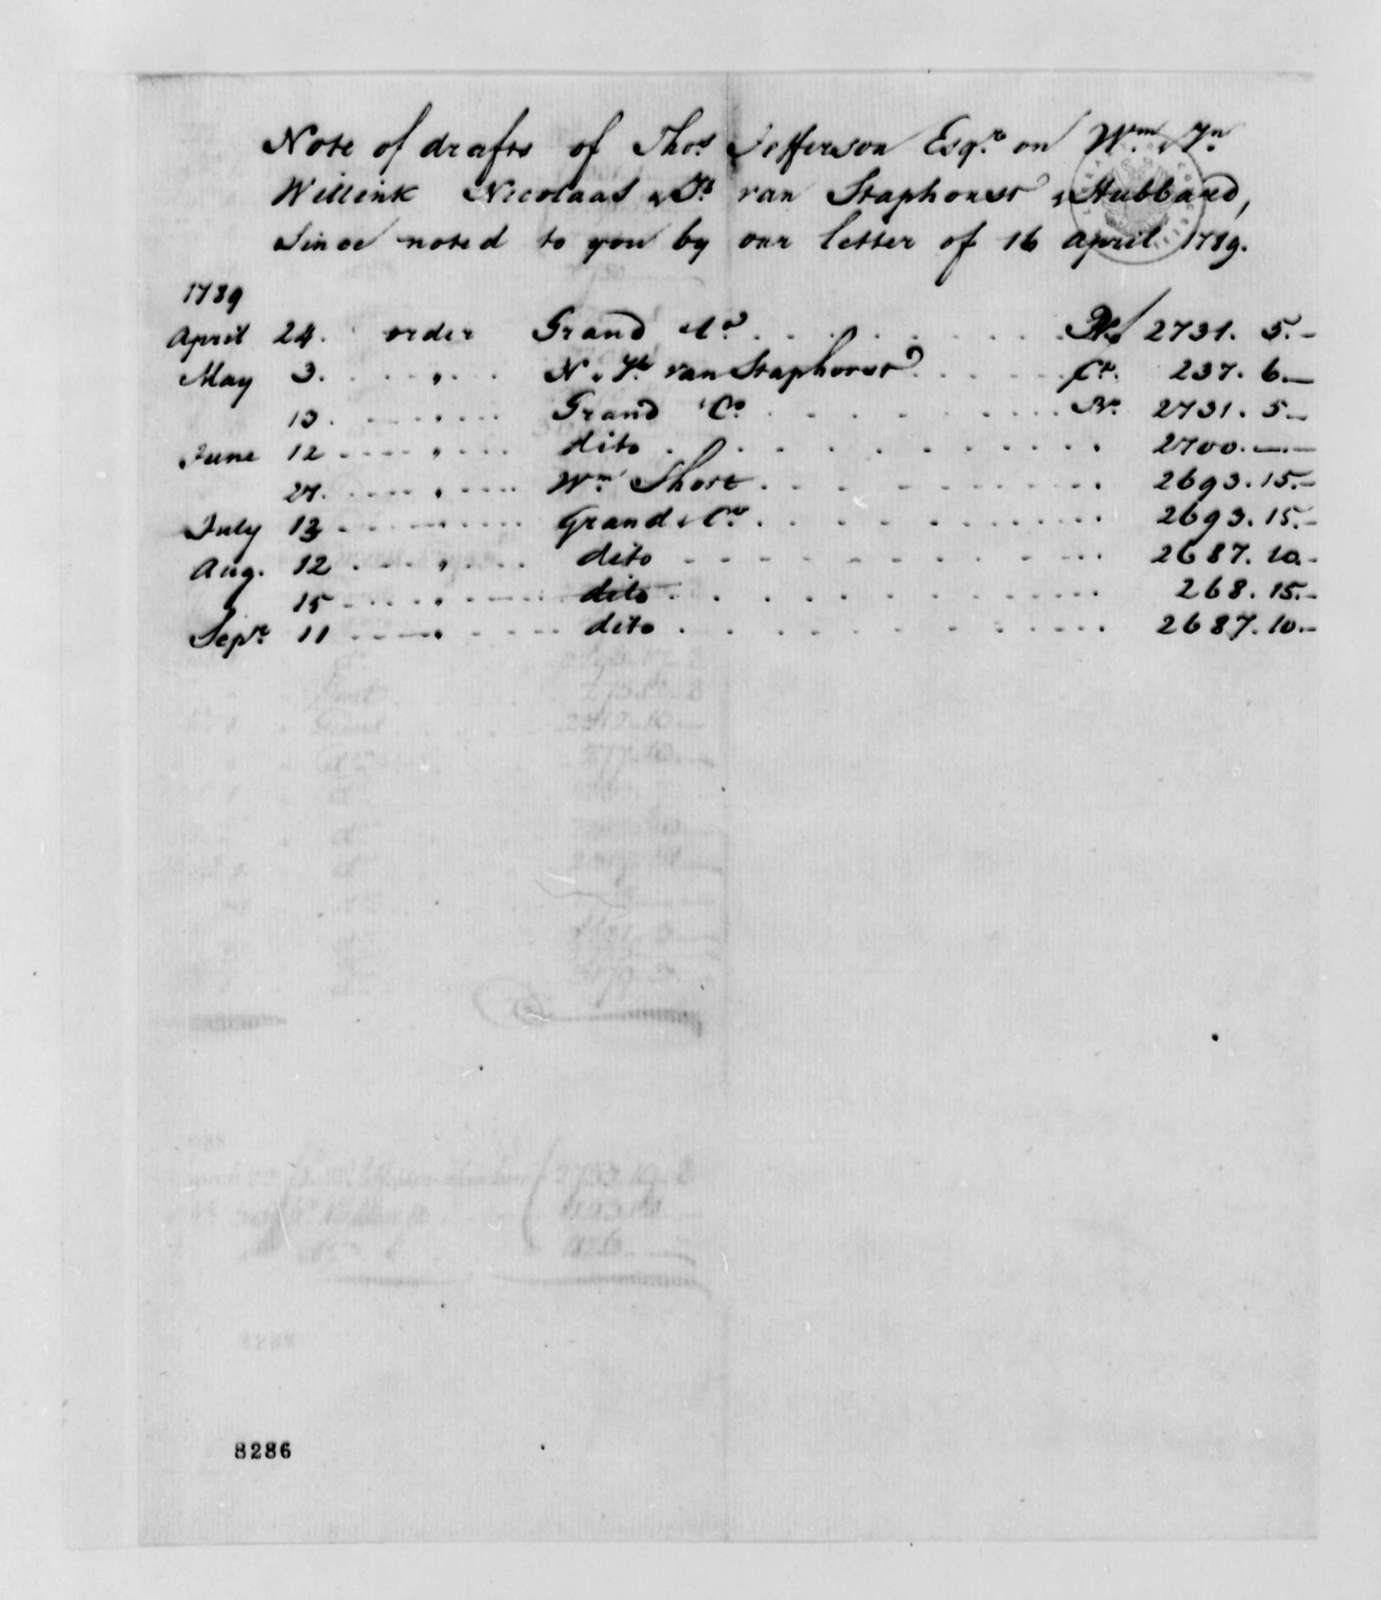 Wilhelm Willink, et al to Thomas Jefferson, April 16, 1789, with Account